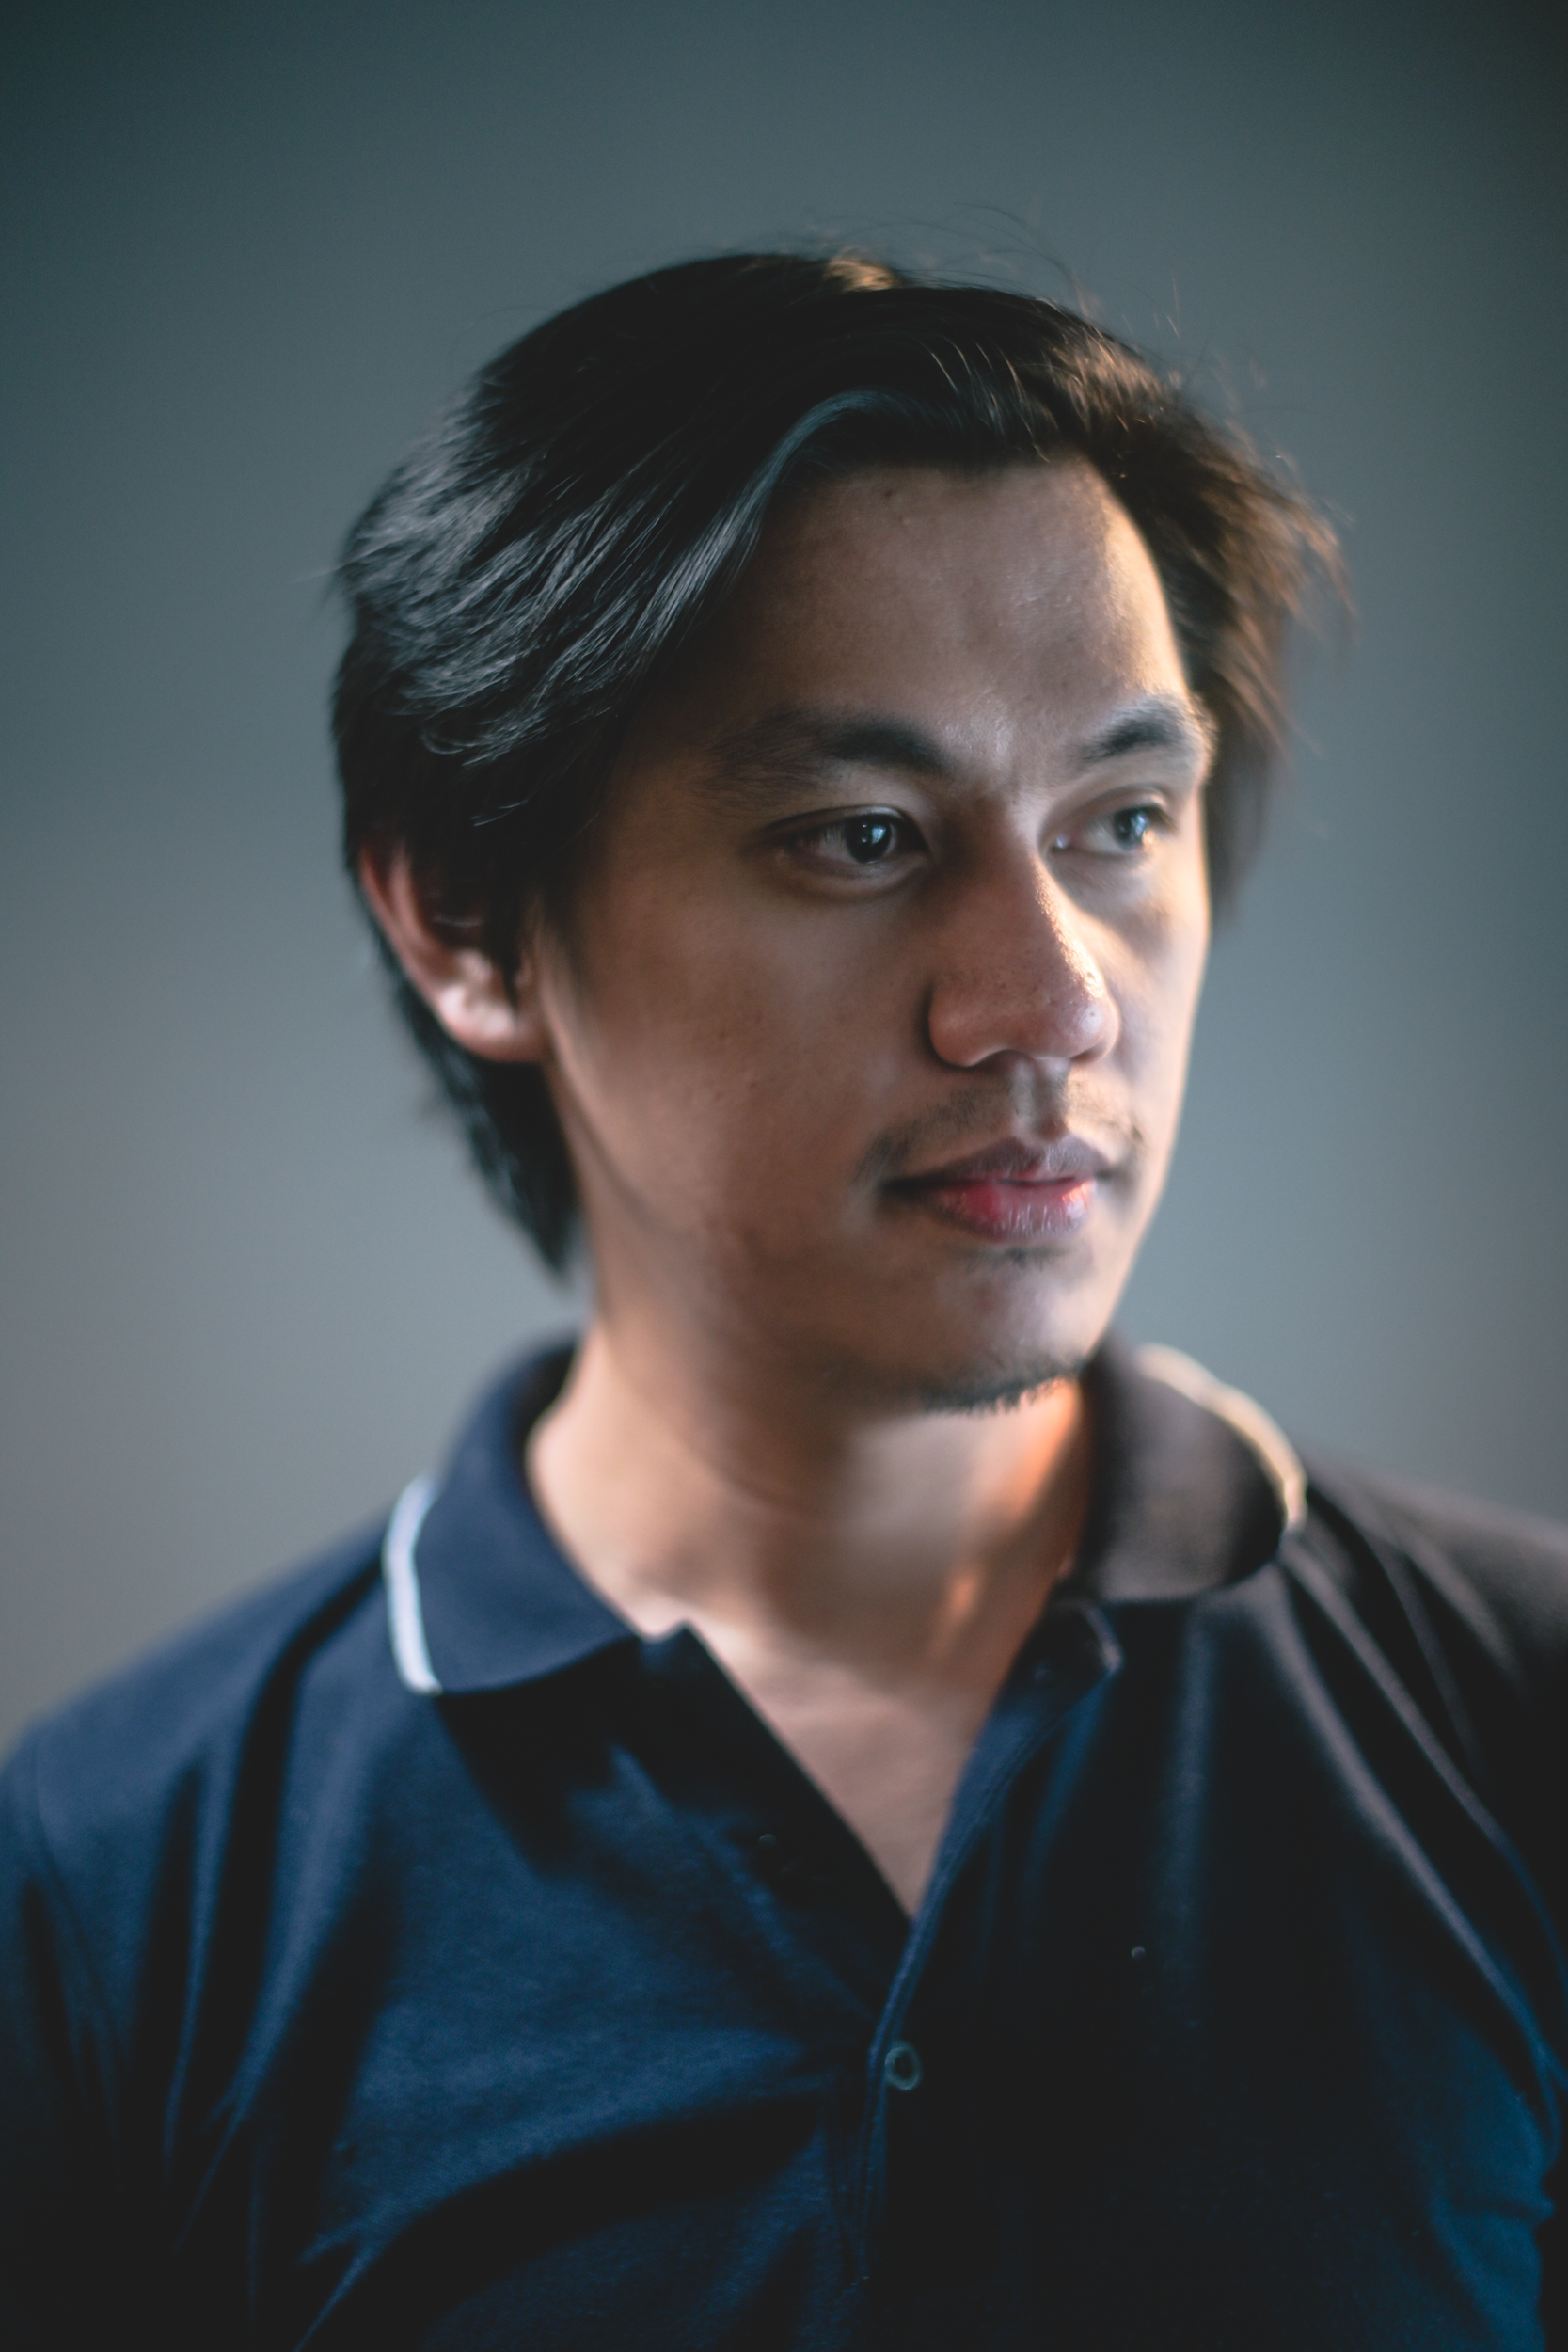 The Creative Partner - John Paul De Guzman